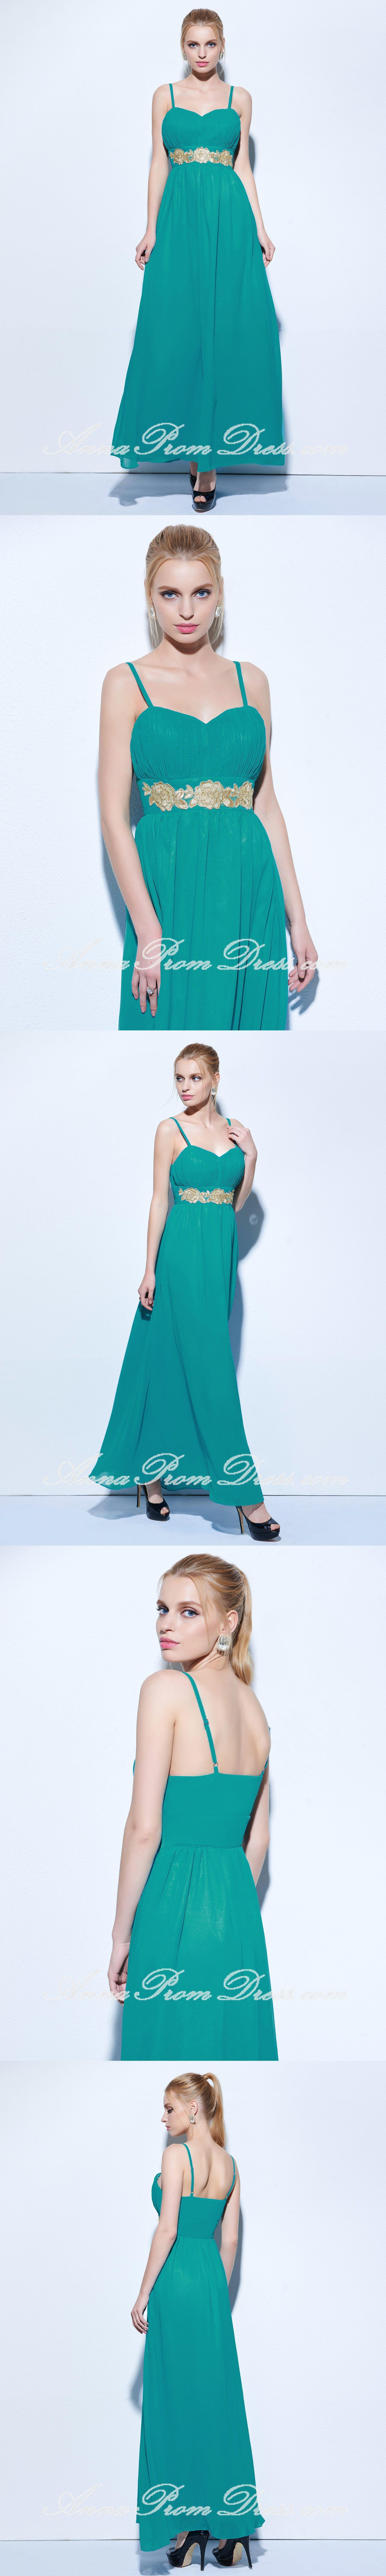 Cheap Prom Dresses A-line Spaghetti Straps Appliques Long Sexy ...